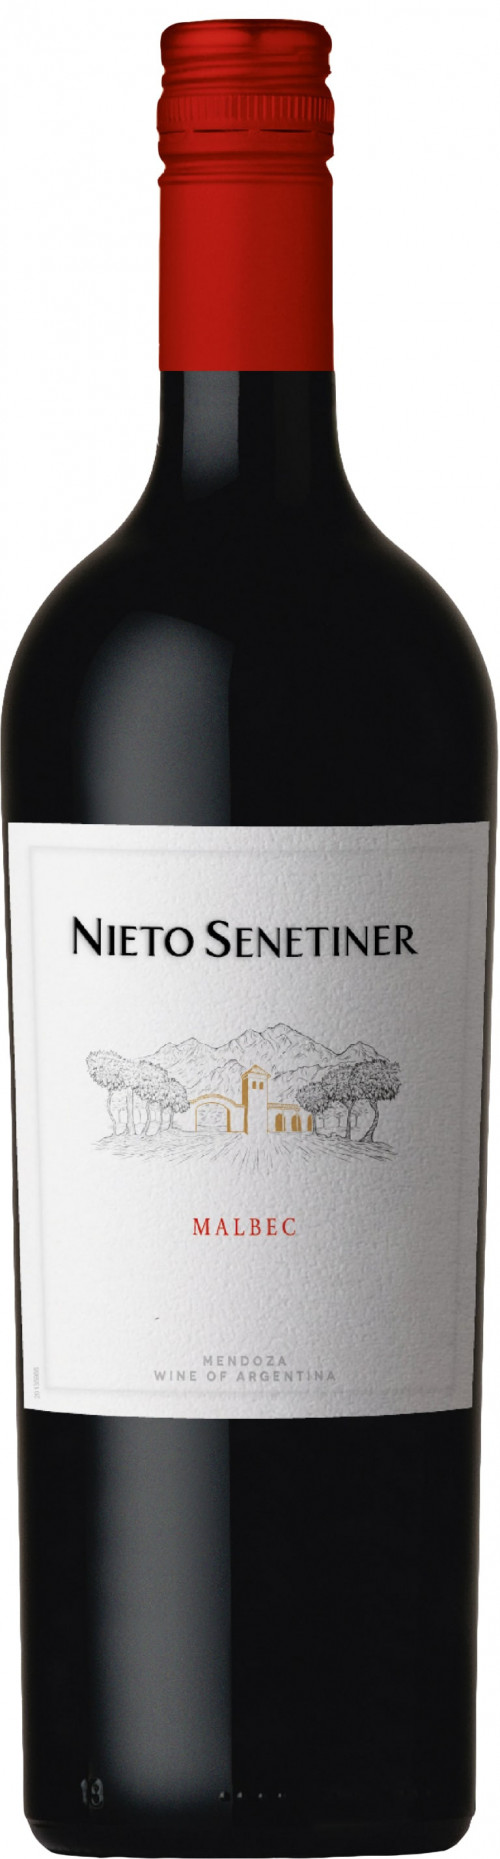 2019 Nieto Senetiner Malbec 750ml